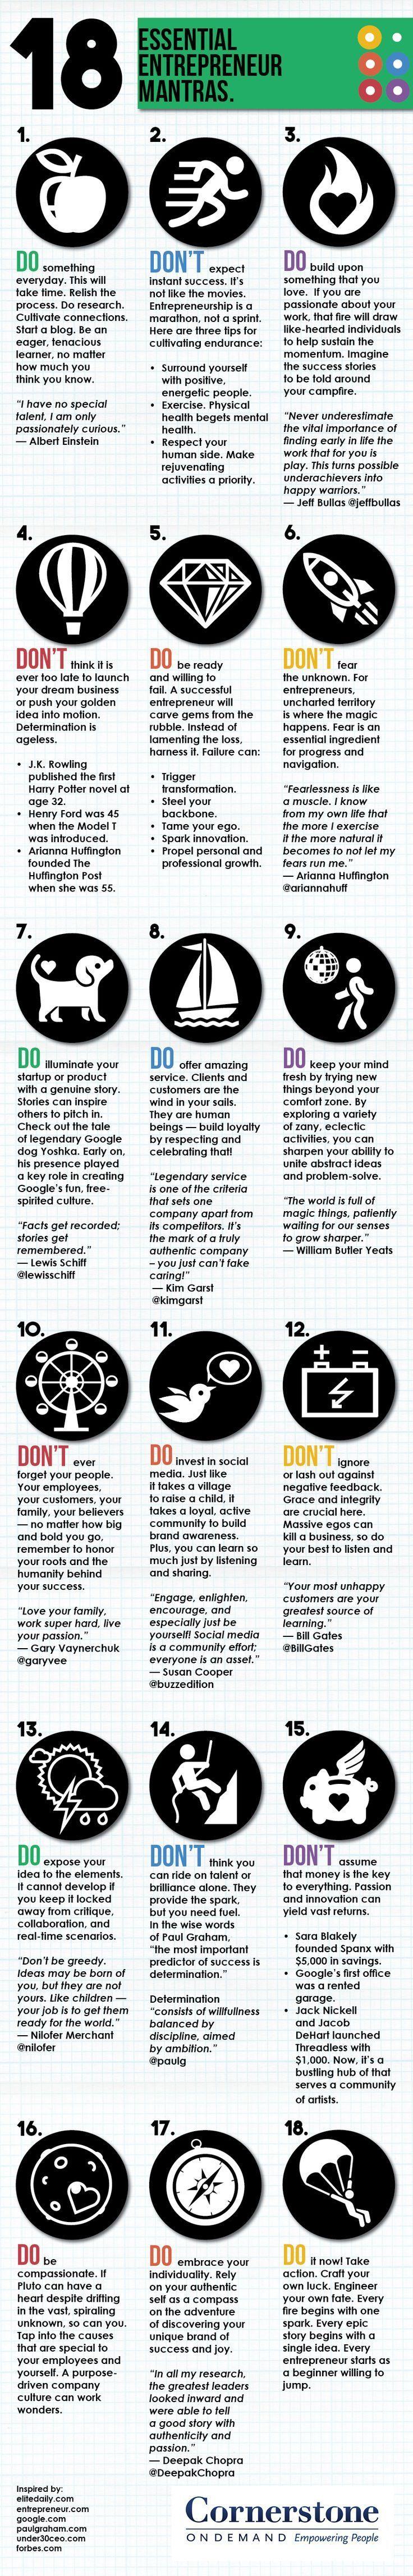 18 Great Business Mantras for Entrepreneurs - #entrepreneur #startups #IdeateVision www.ideatevision.com